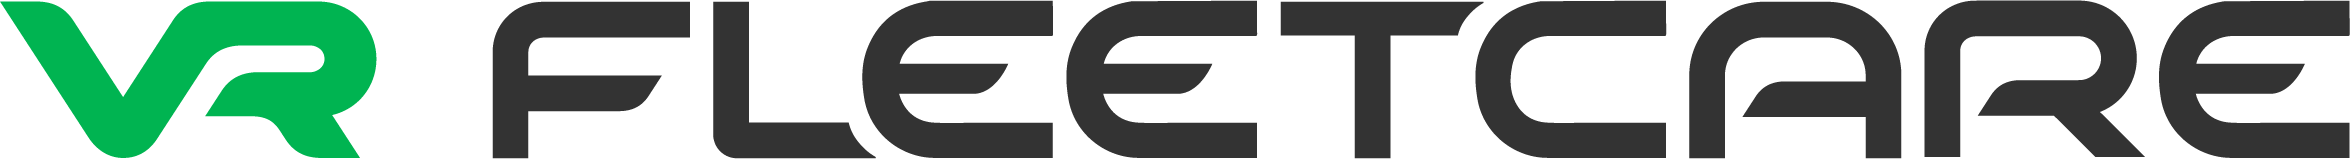 VR FleetCare